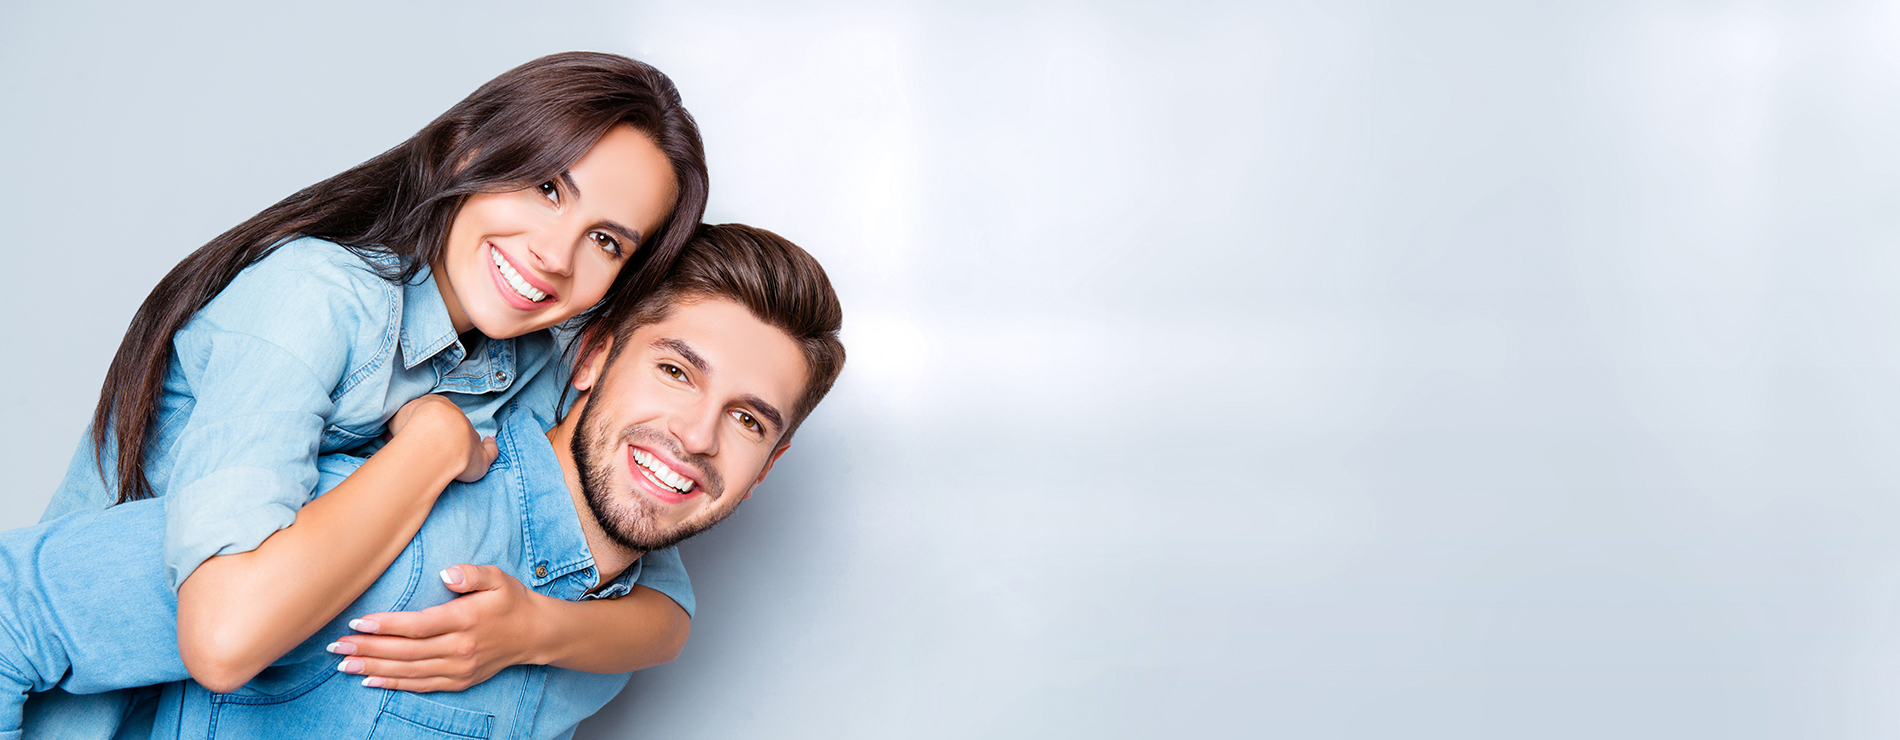 Riverfront Dental Cosmetic Services | Riverfront Dental